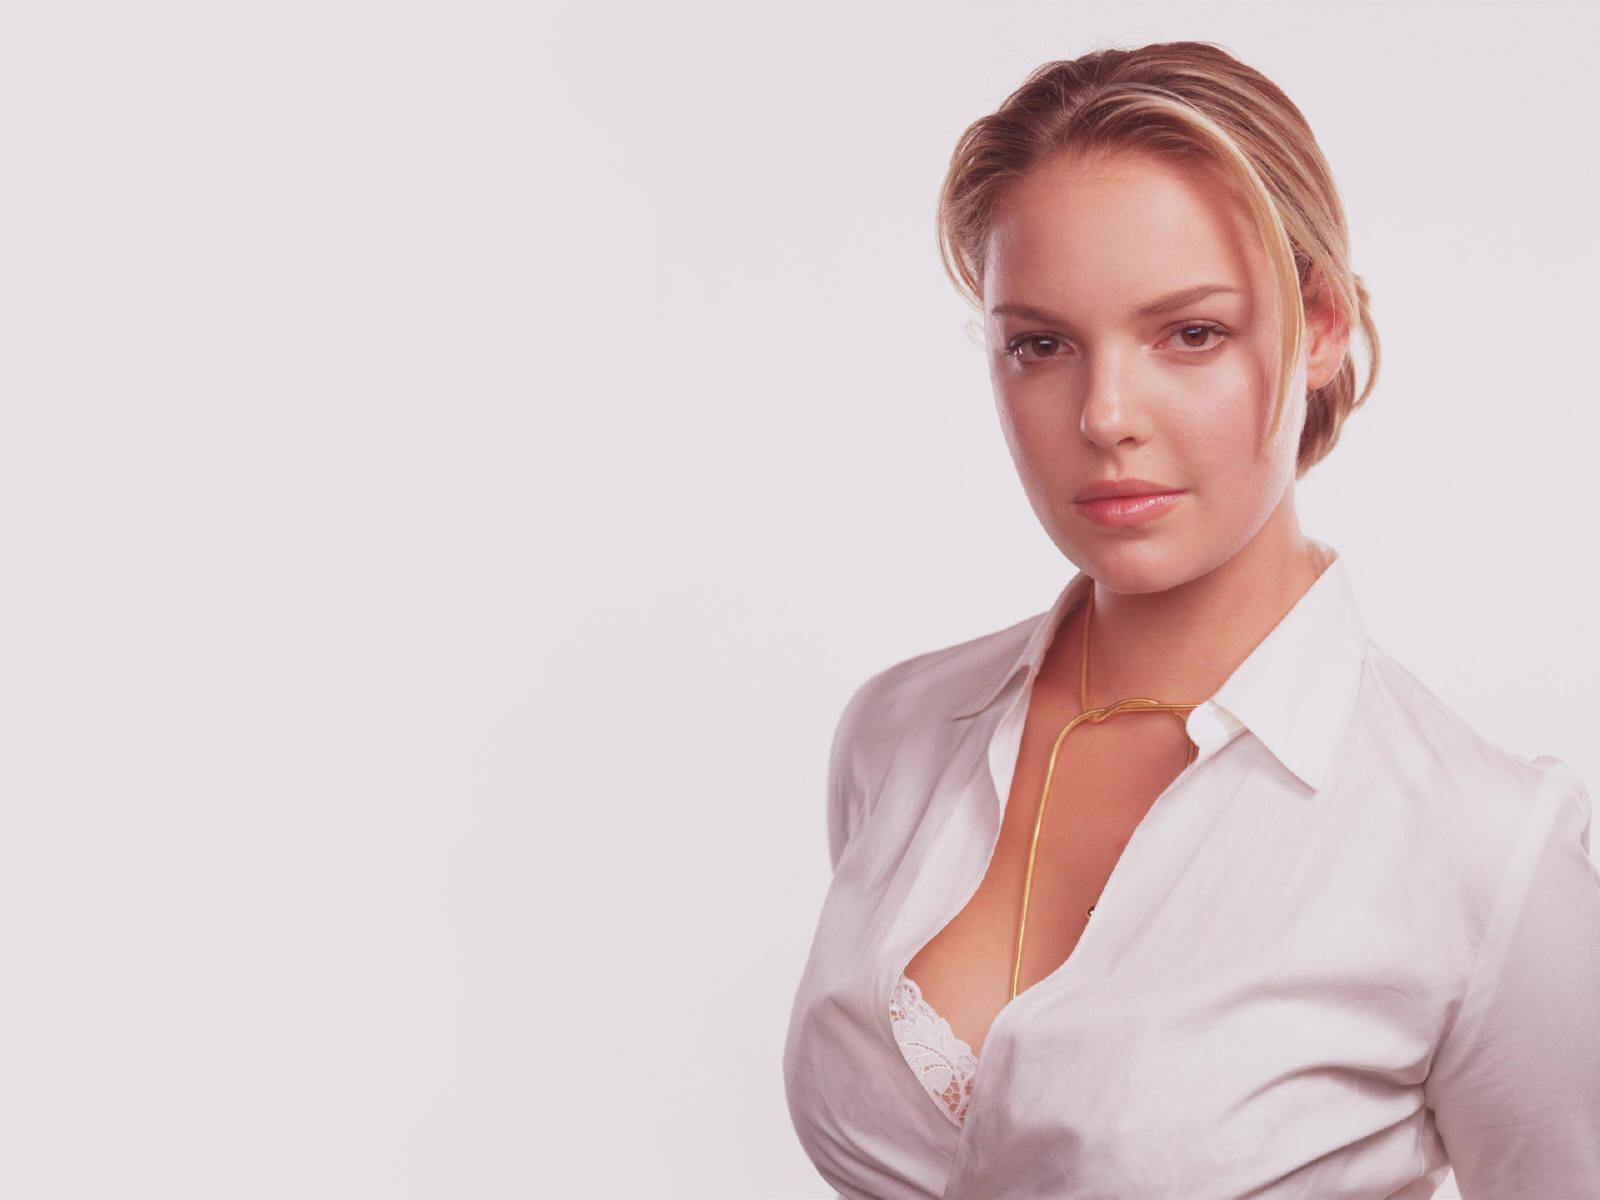 hollywood female stars recent - photo #45